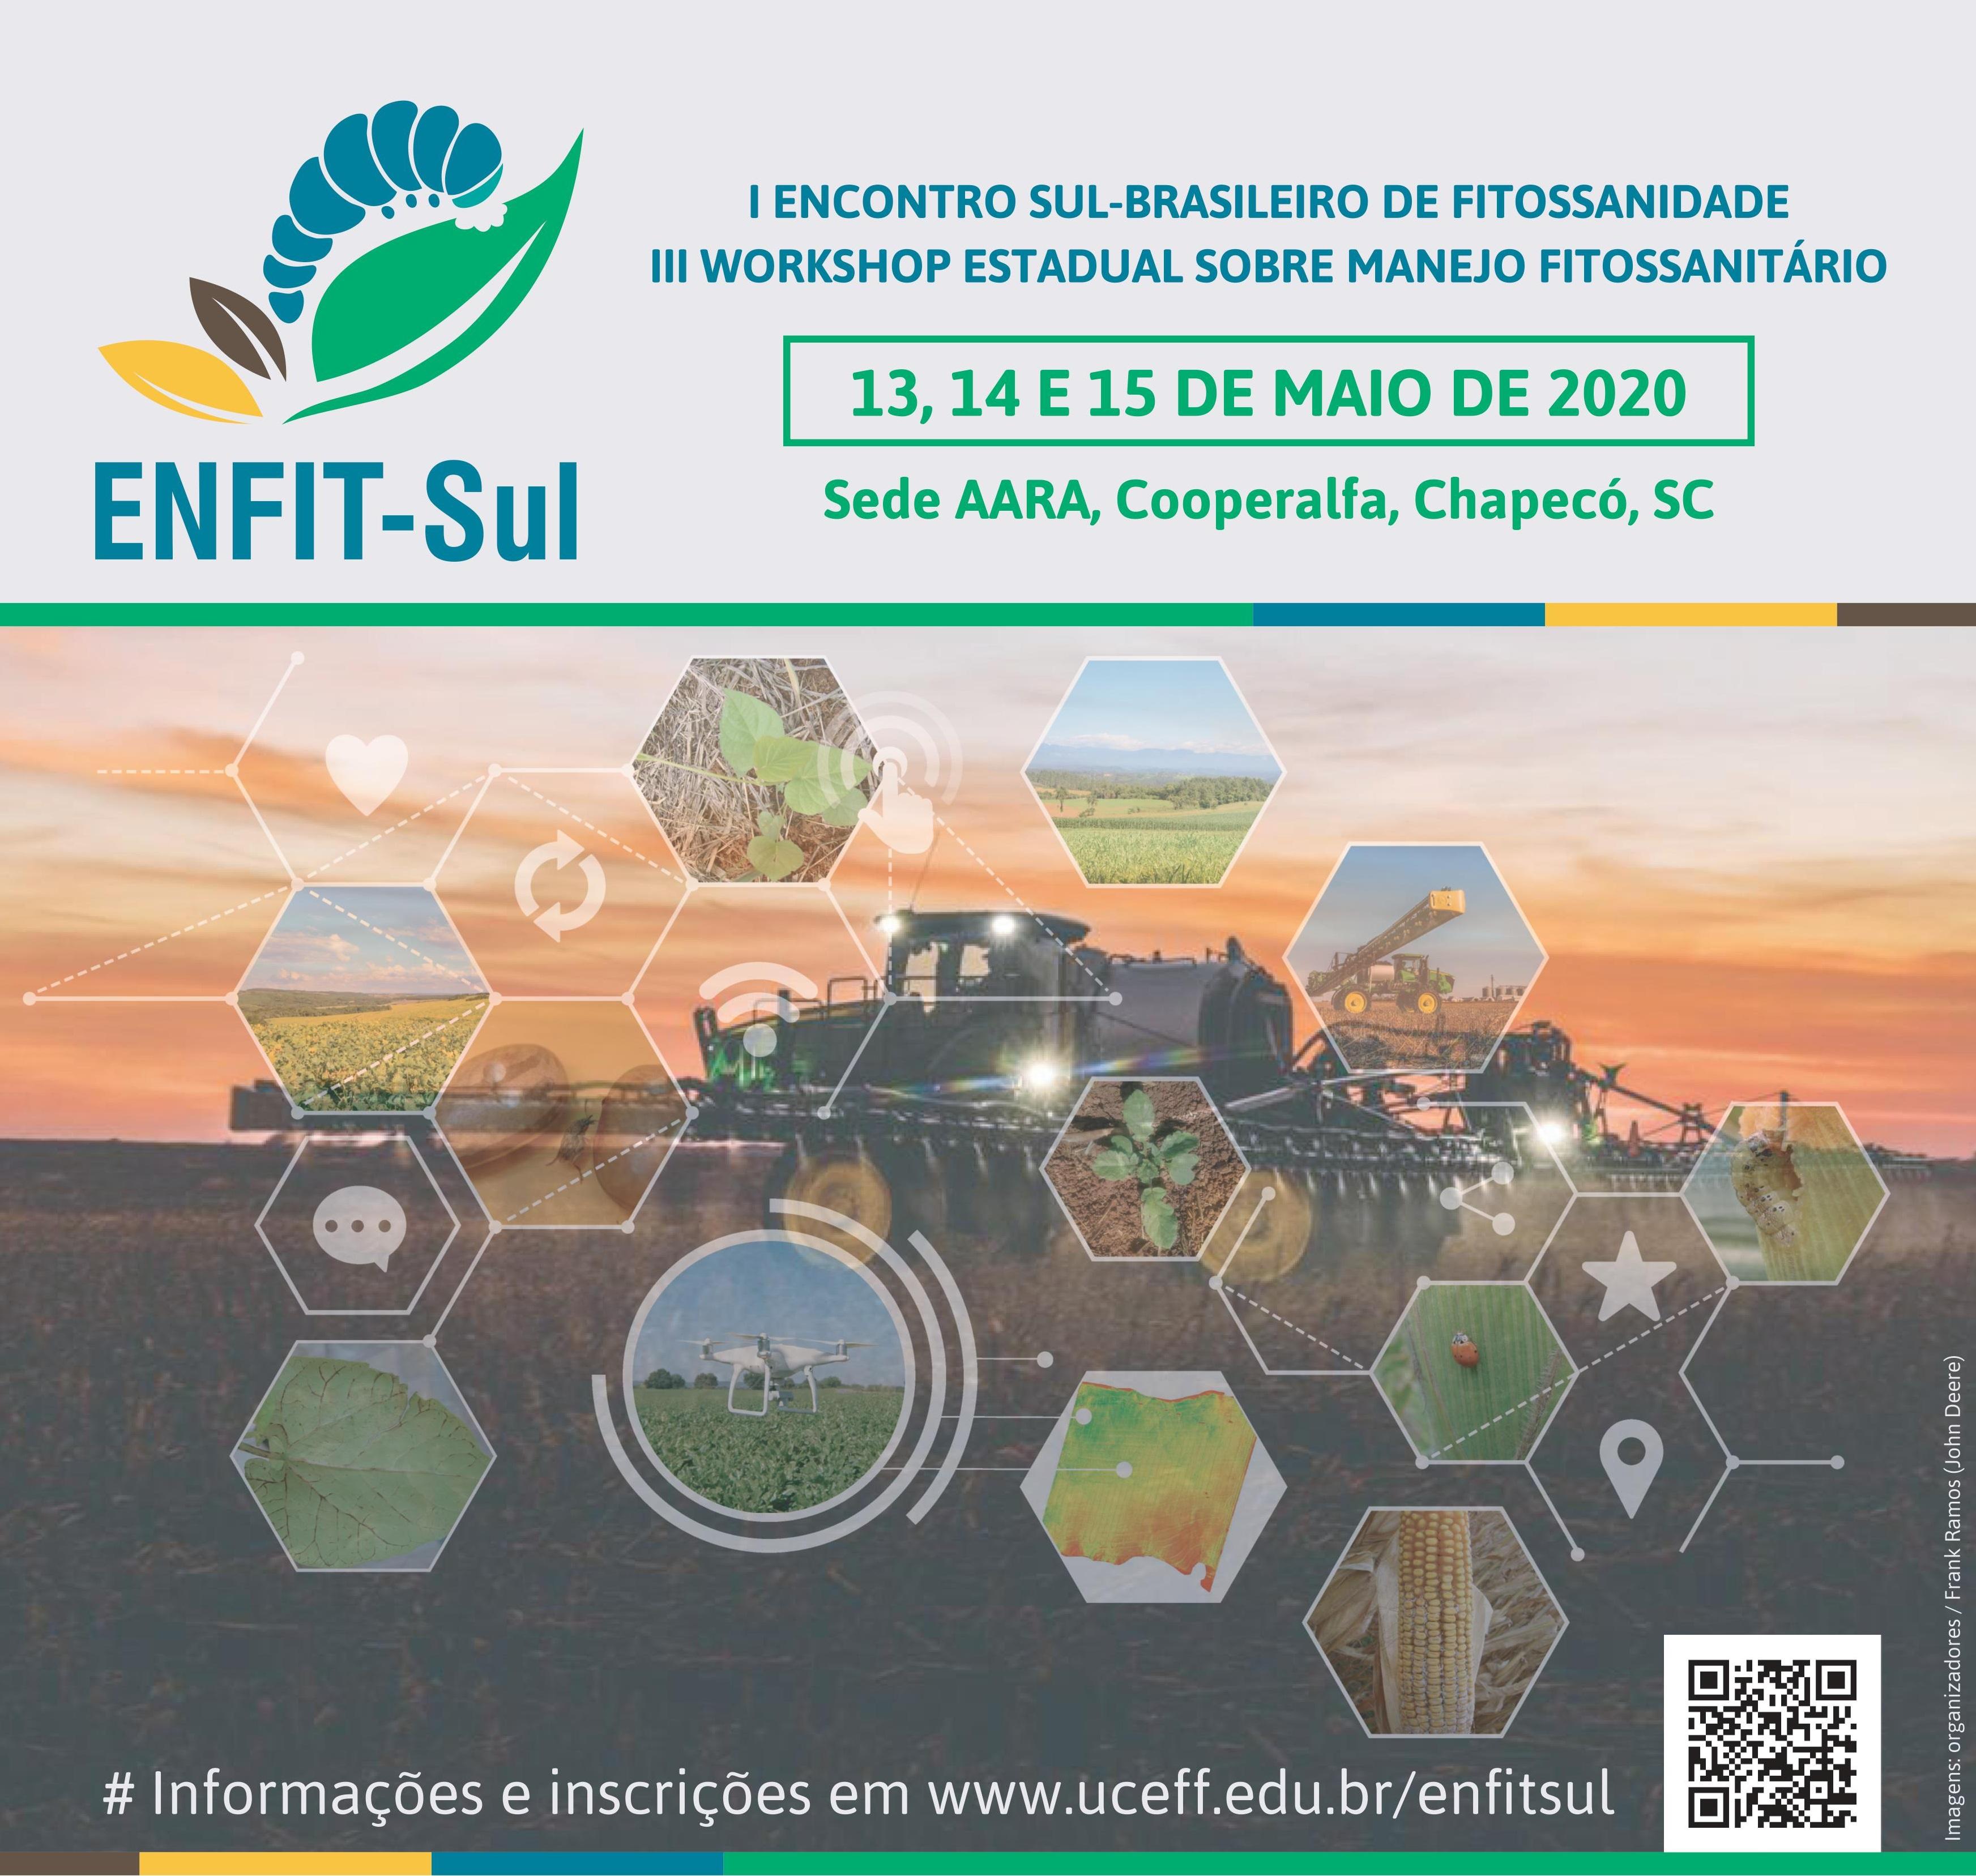 EFIT-Sul